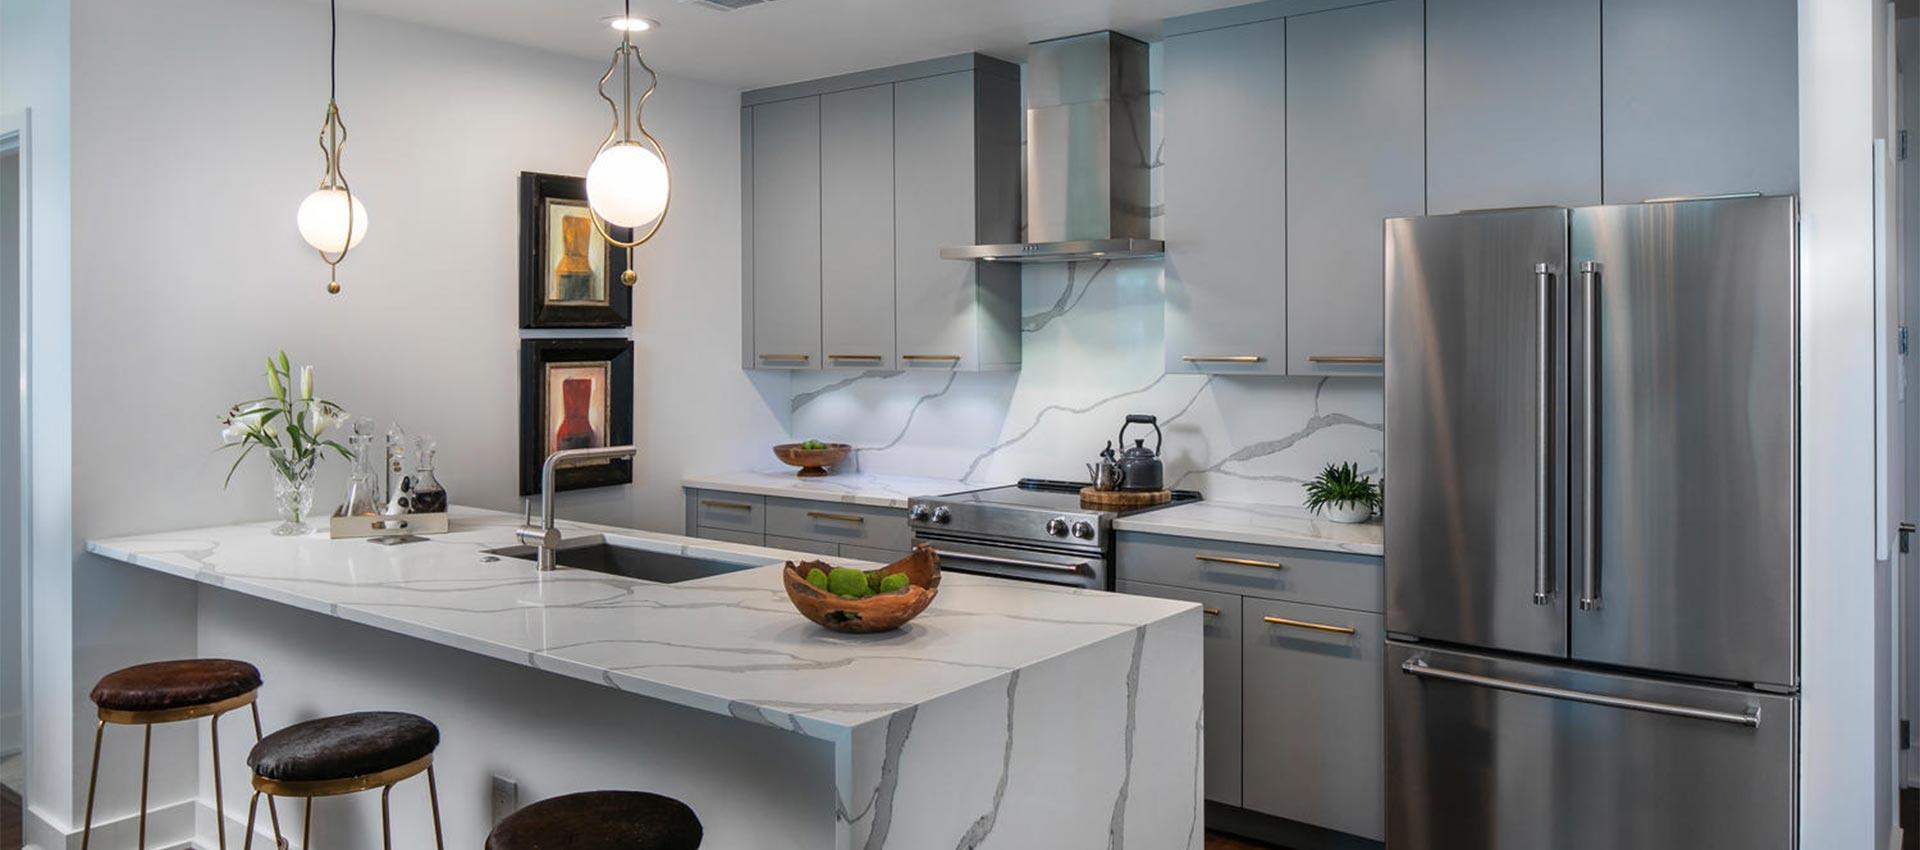 Amish cabinets michigan mf cabinets for Custom kitchen cabinets